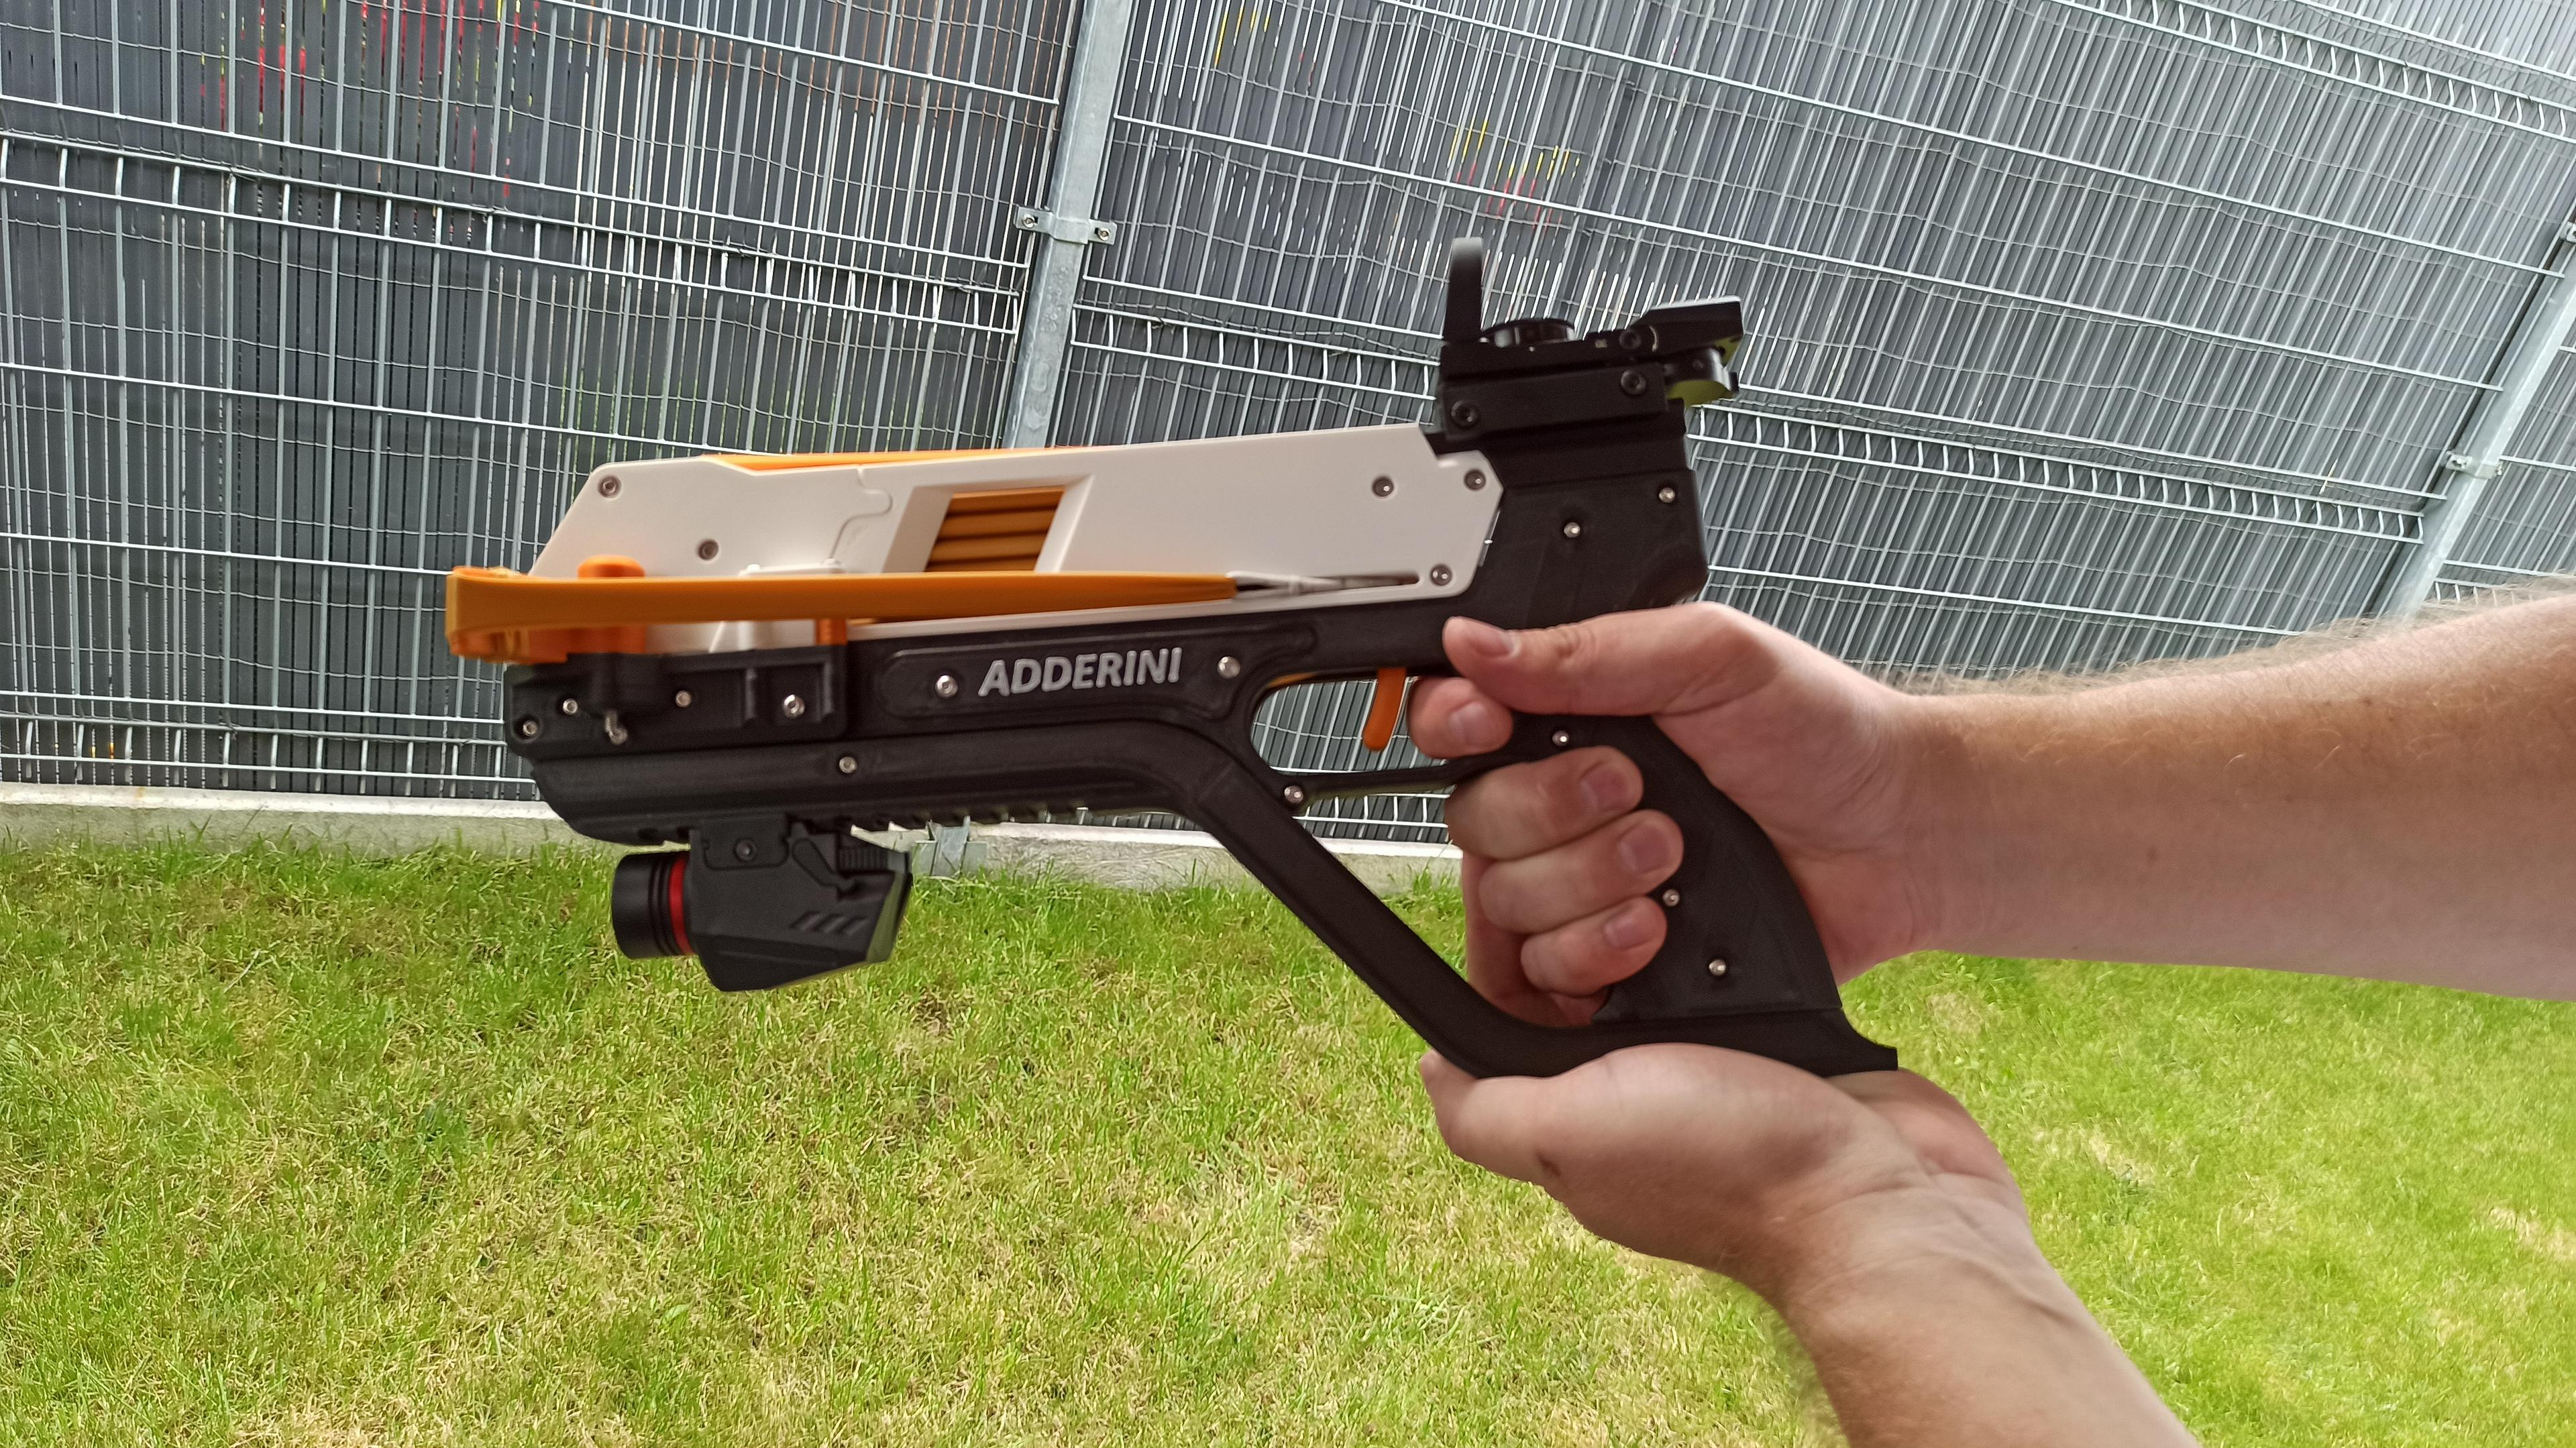 adderini_pistol_35.jpg